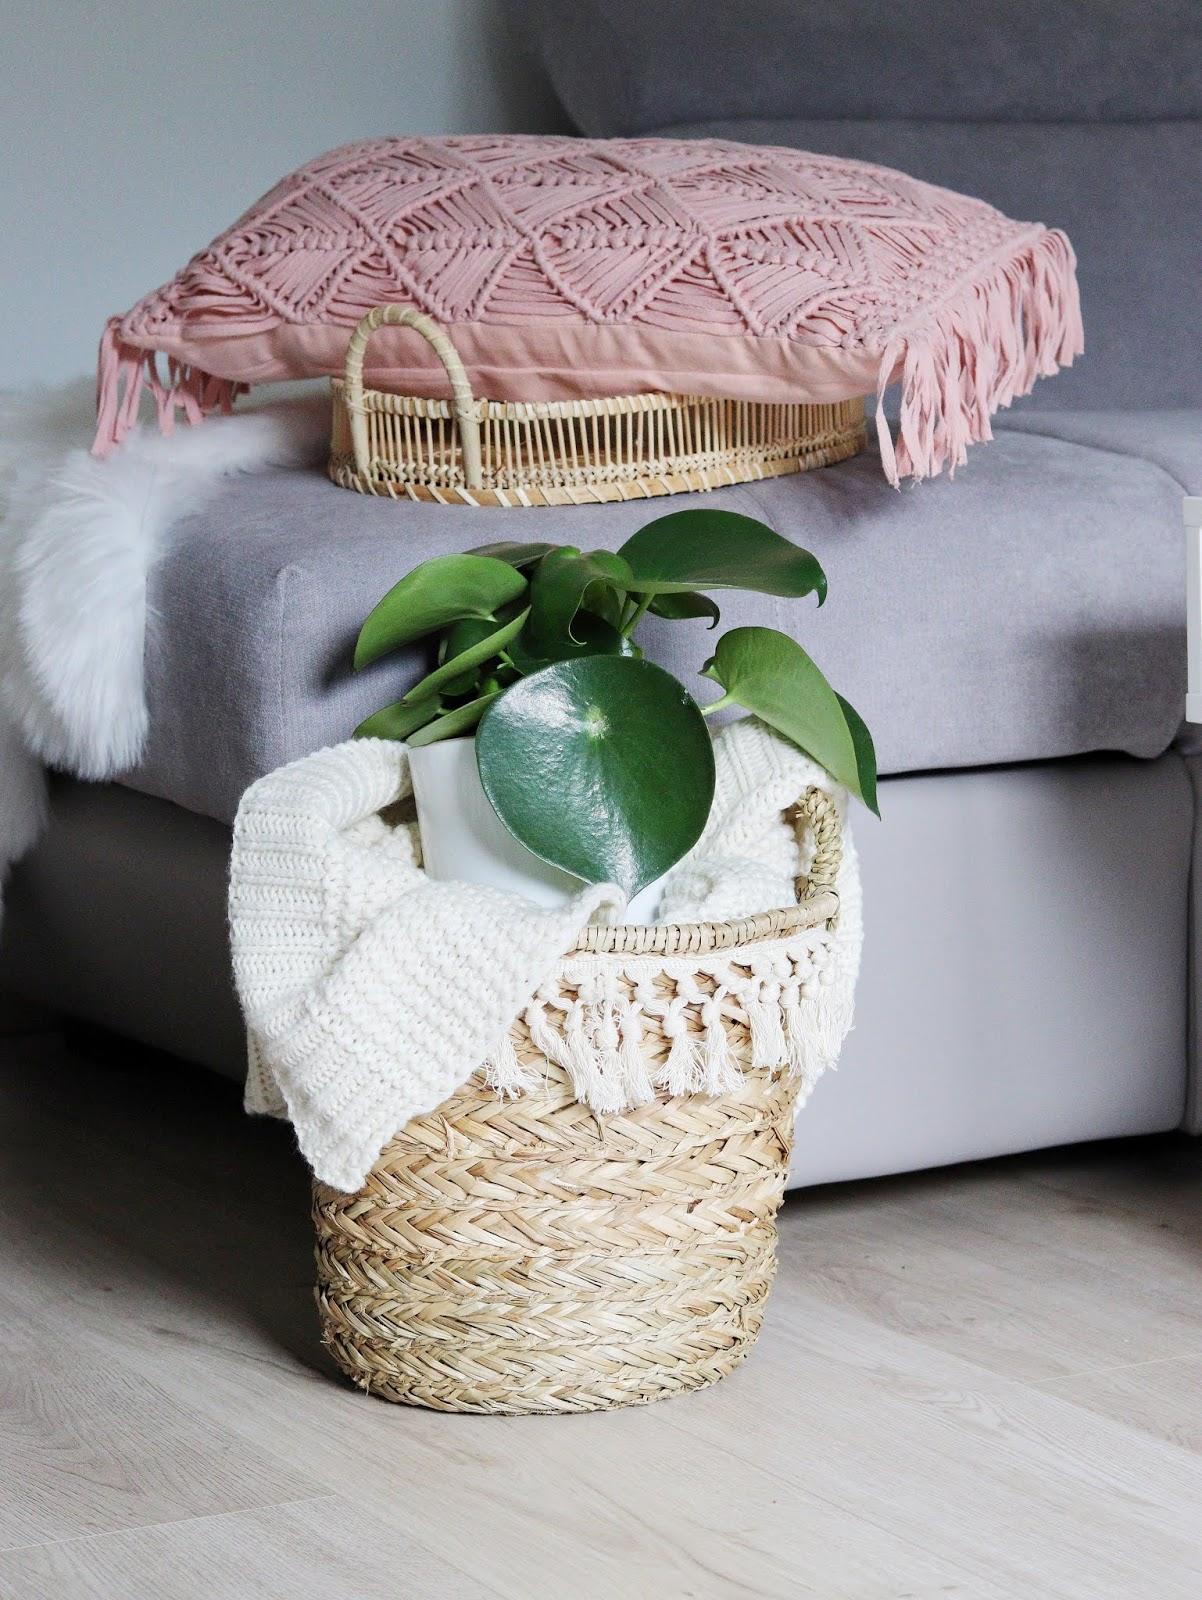 Mömax, Jysk, Koko Moko, oprema doma, dekoracija